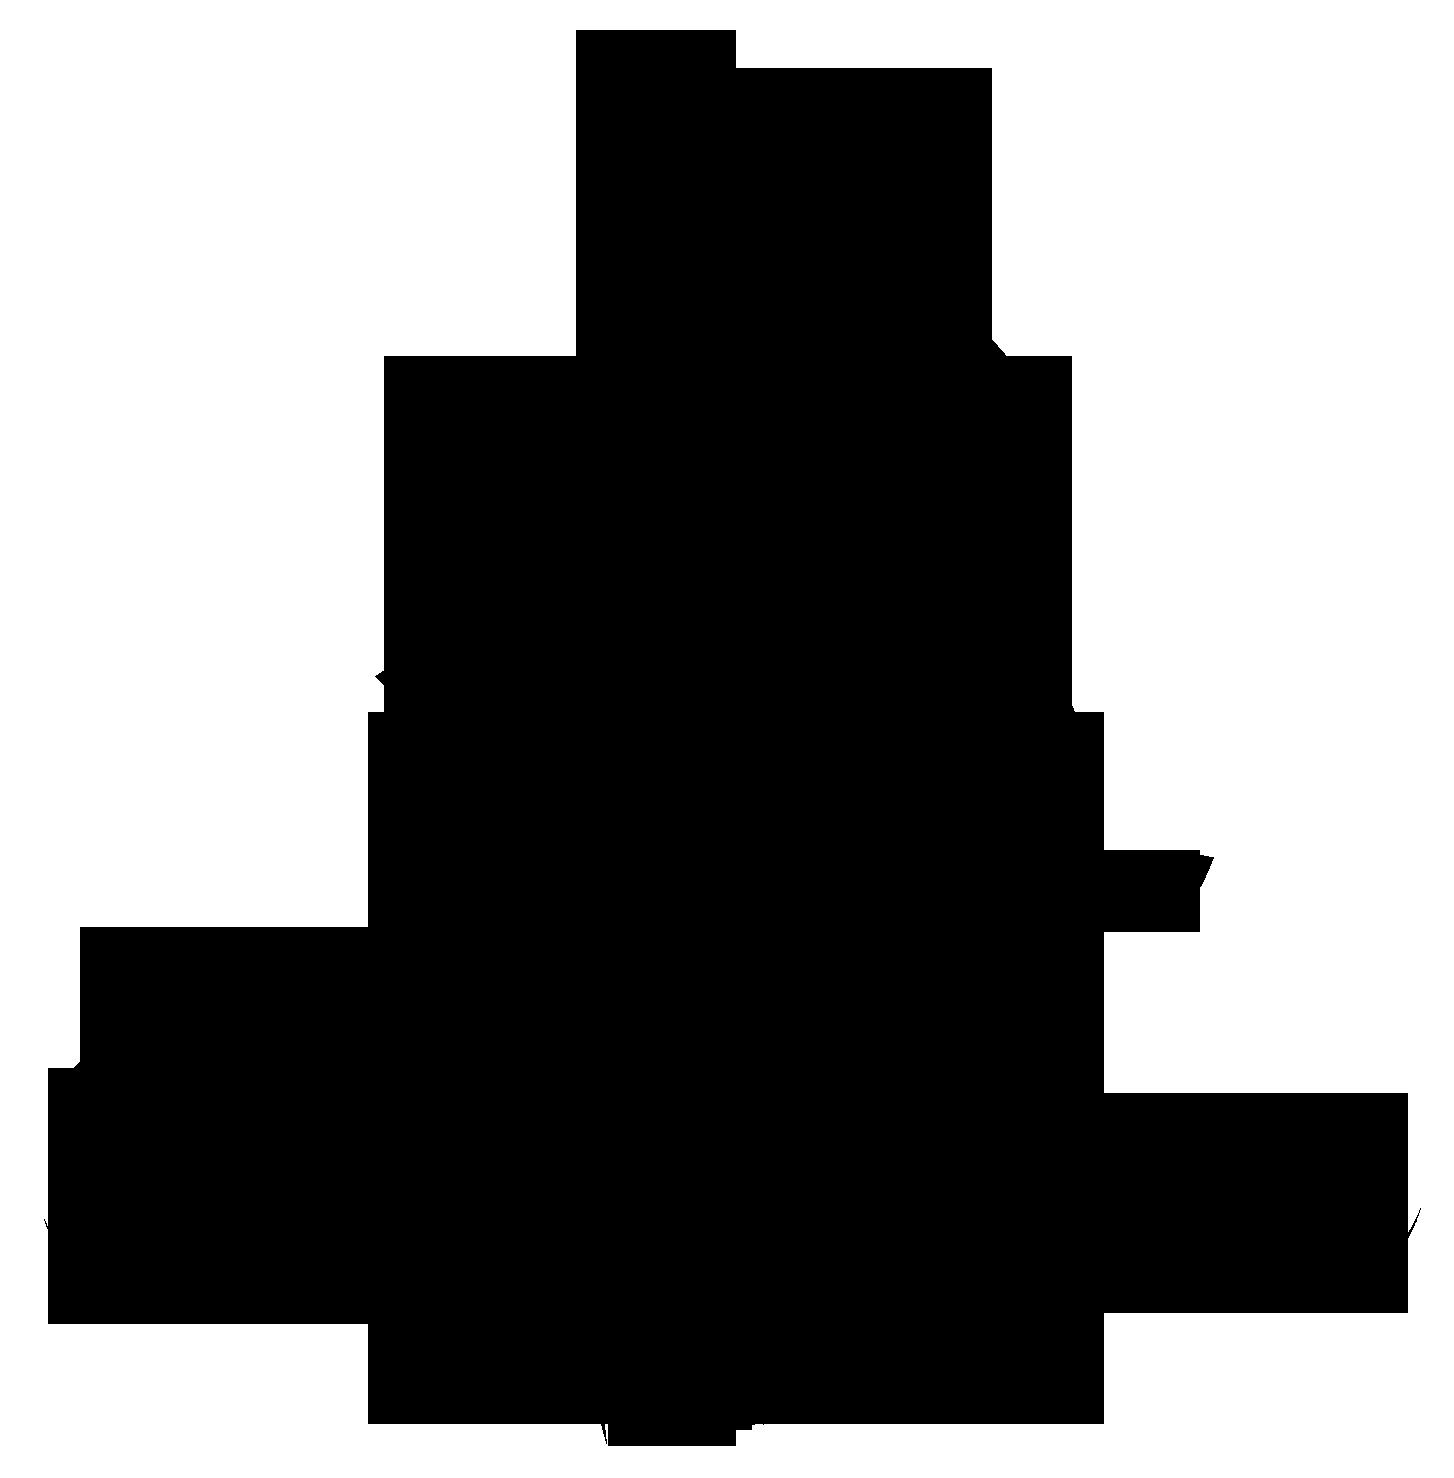 Flower Silhouette Transparent Image